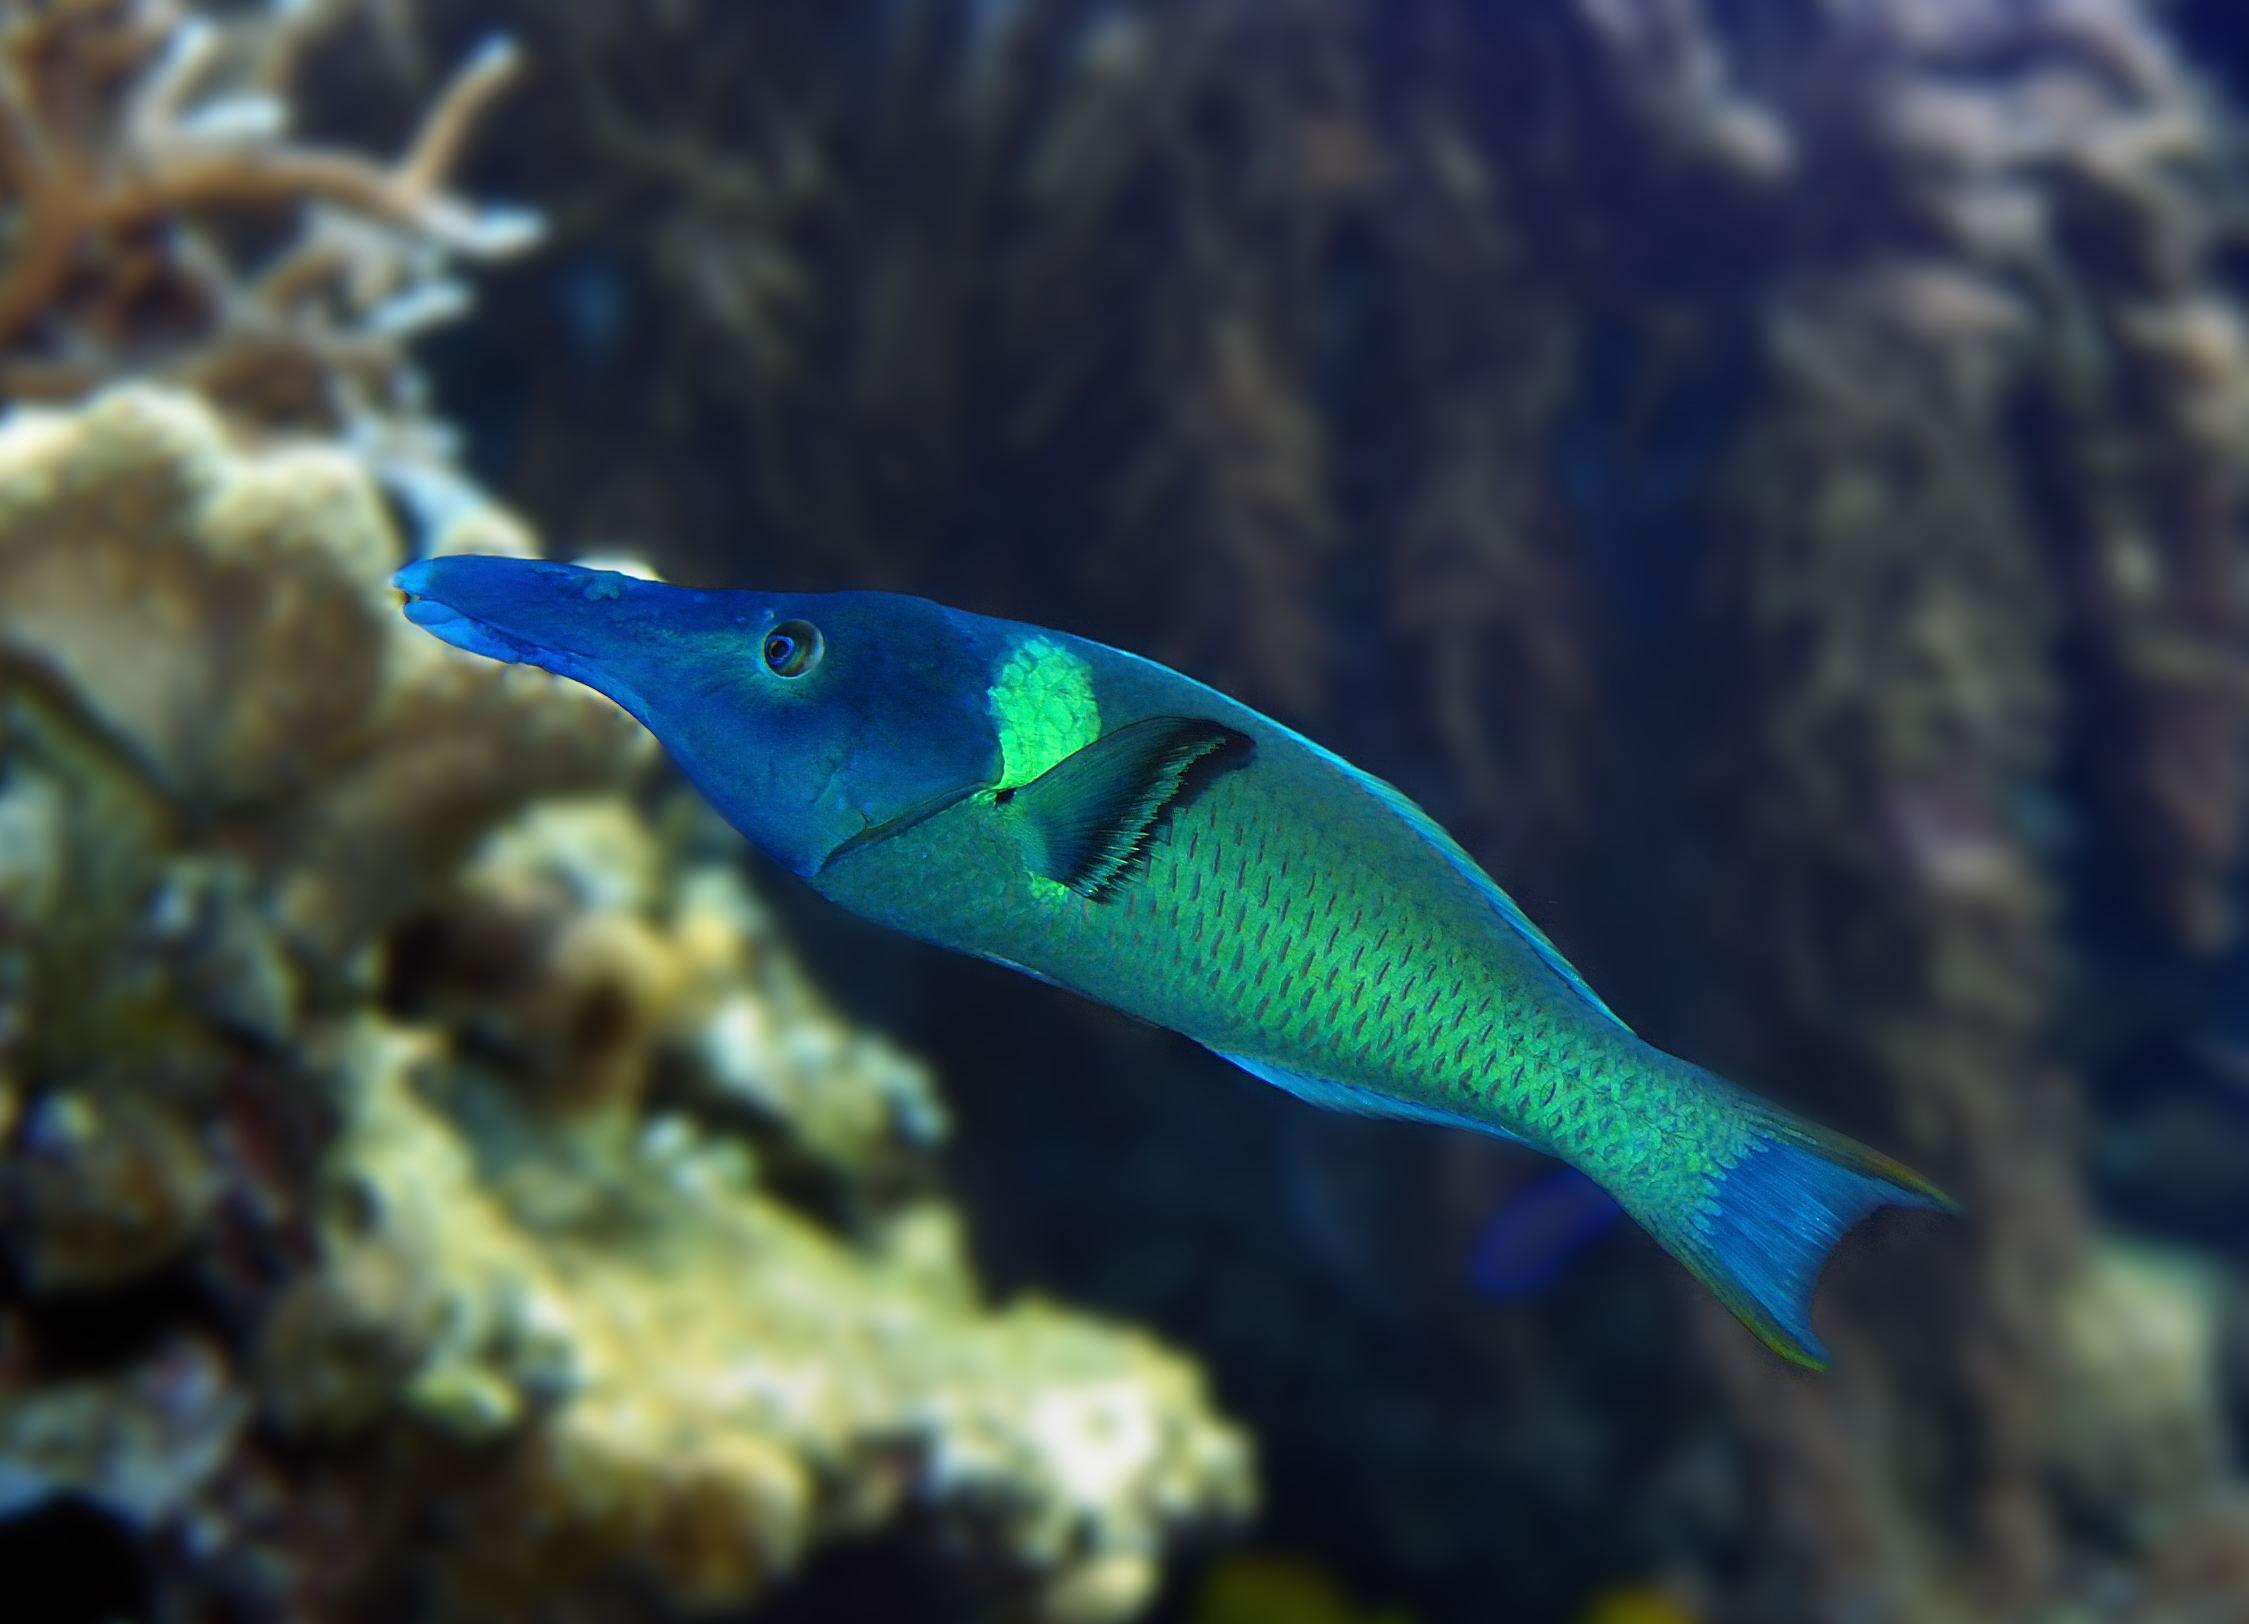 www2233pgom_如图 ,应为   隆头鱼科      labridae        尖嘴鱼属    gomphos